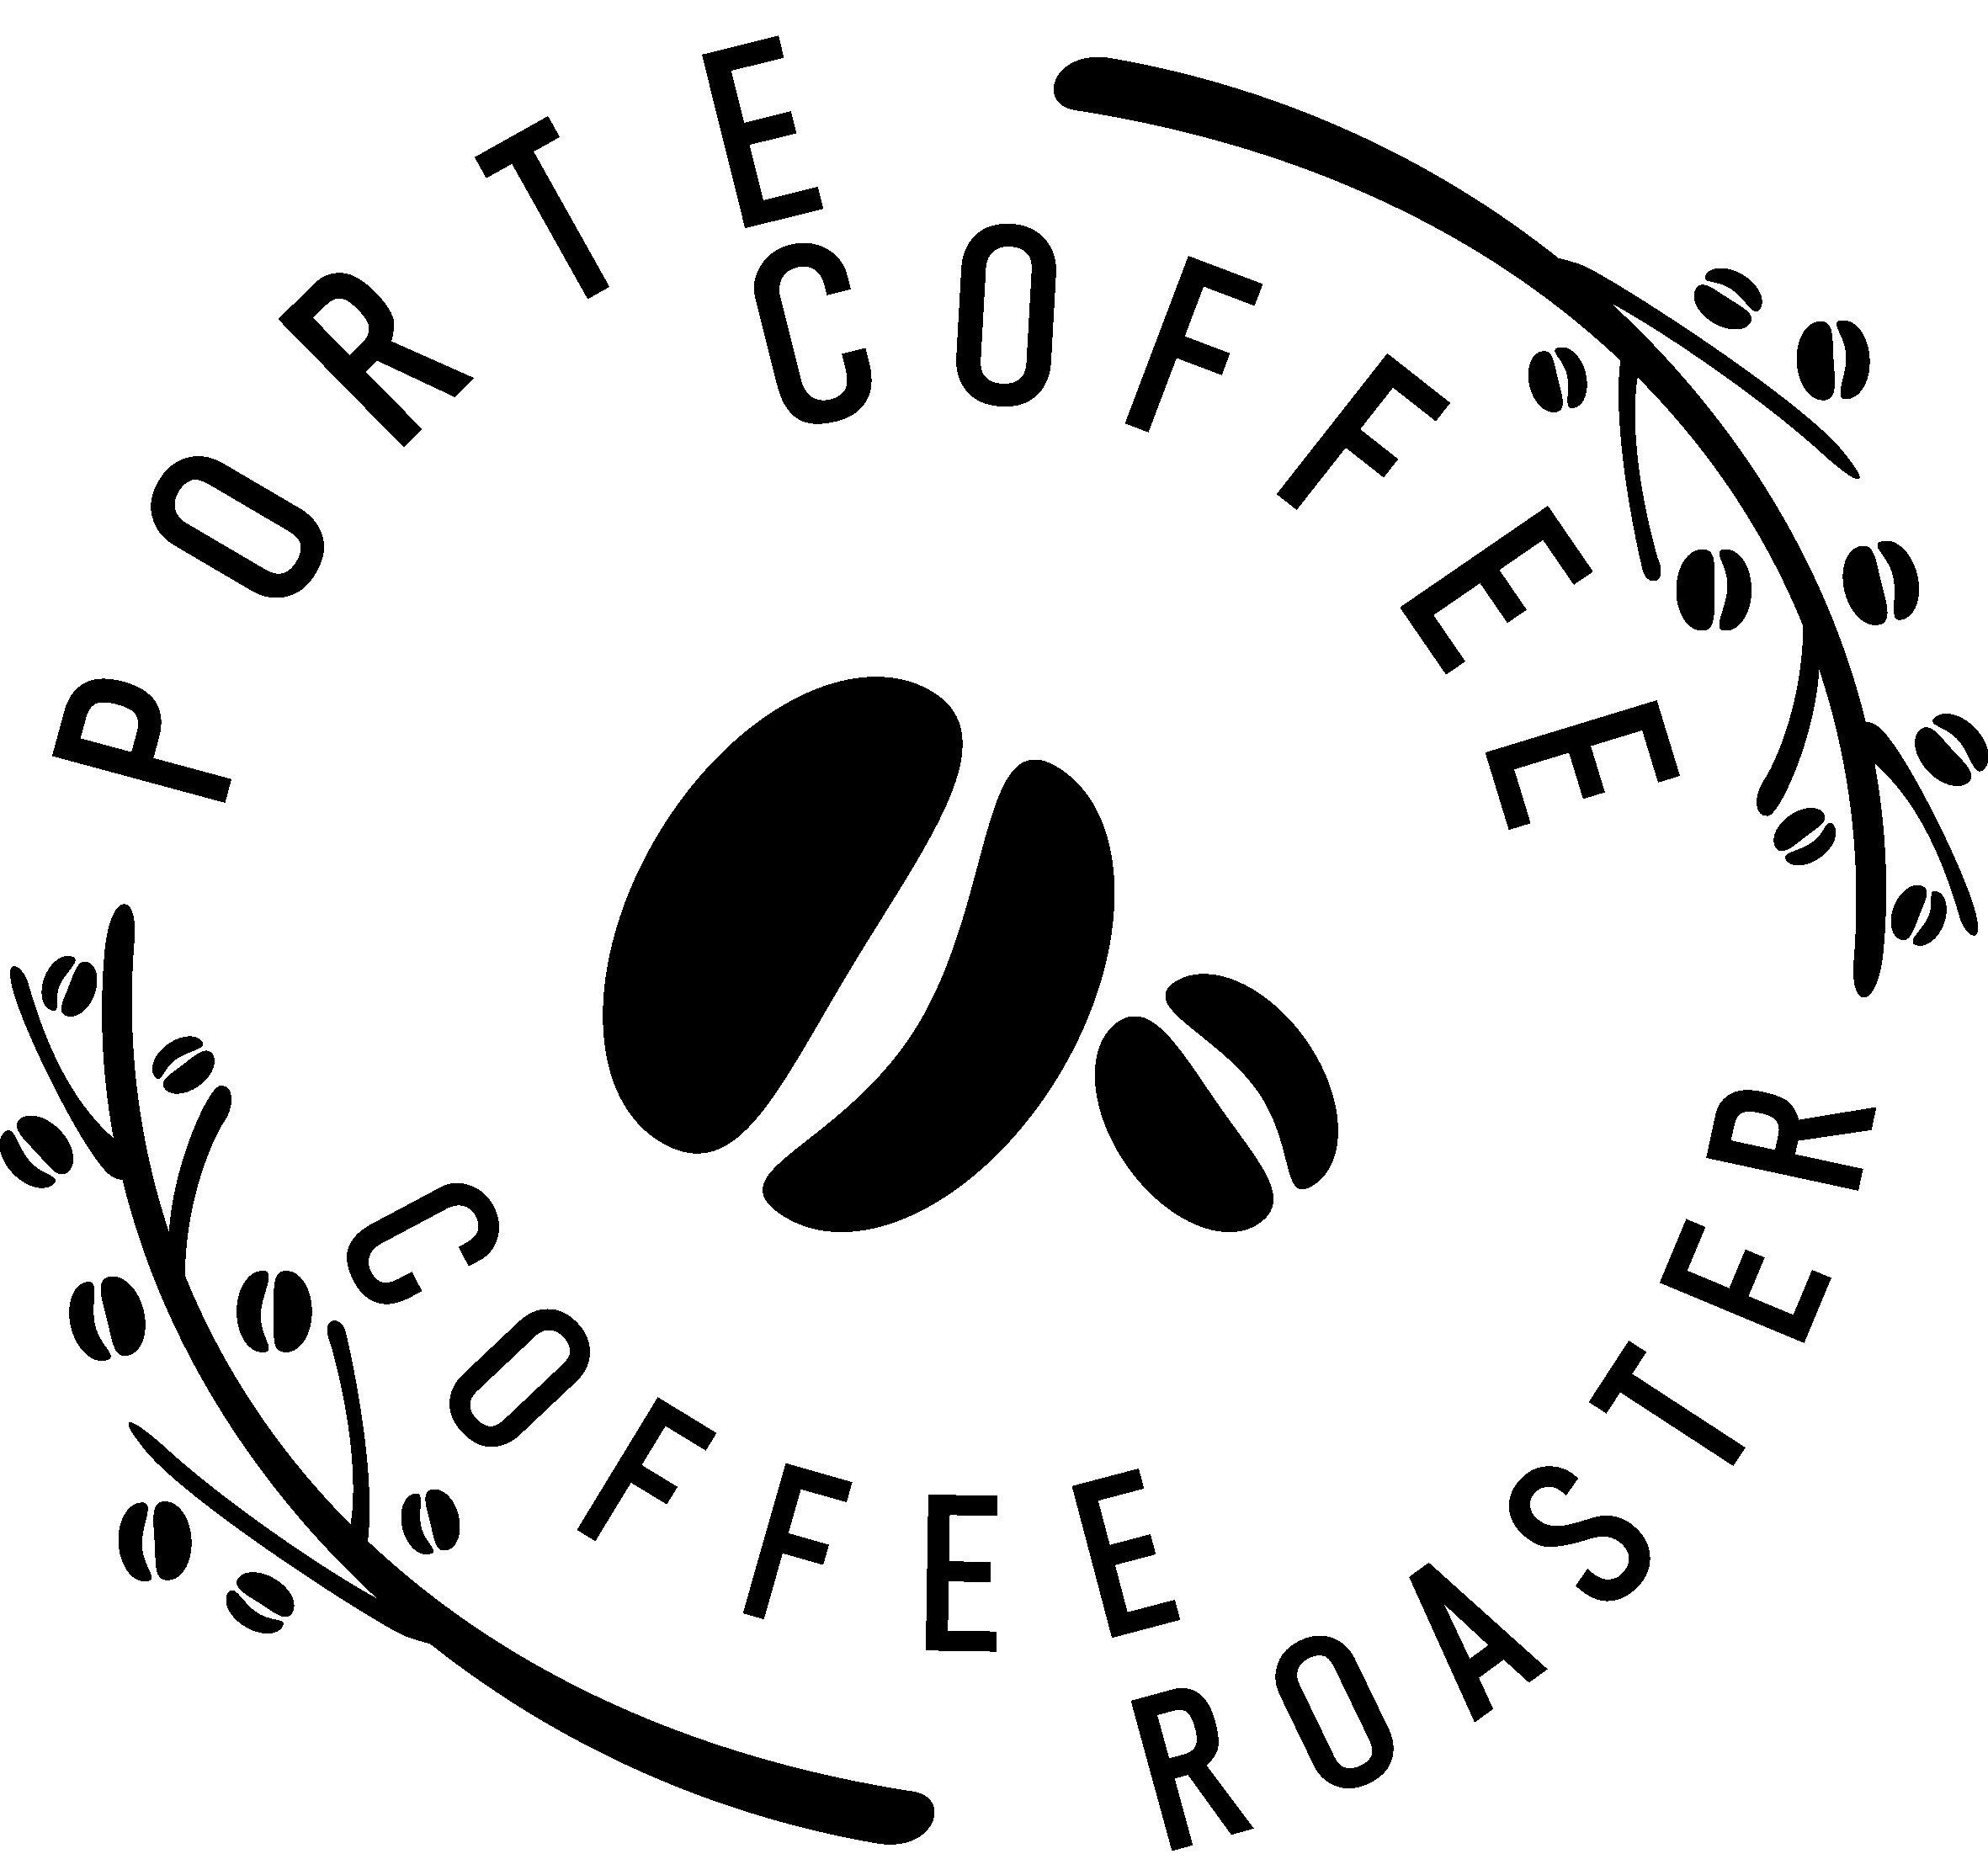 PORTE COFFEE(ぽるとこーひー) | 岡山の自家焙煎珈琲専門店